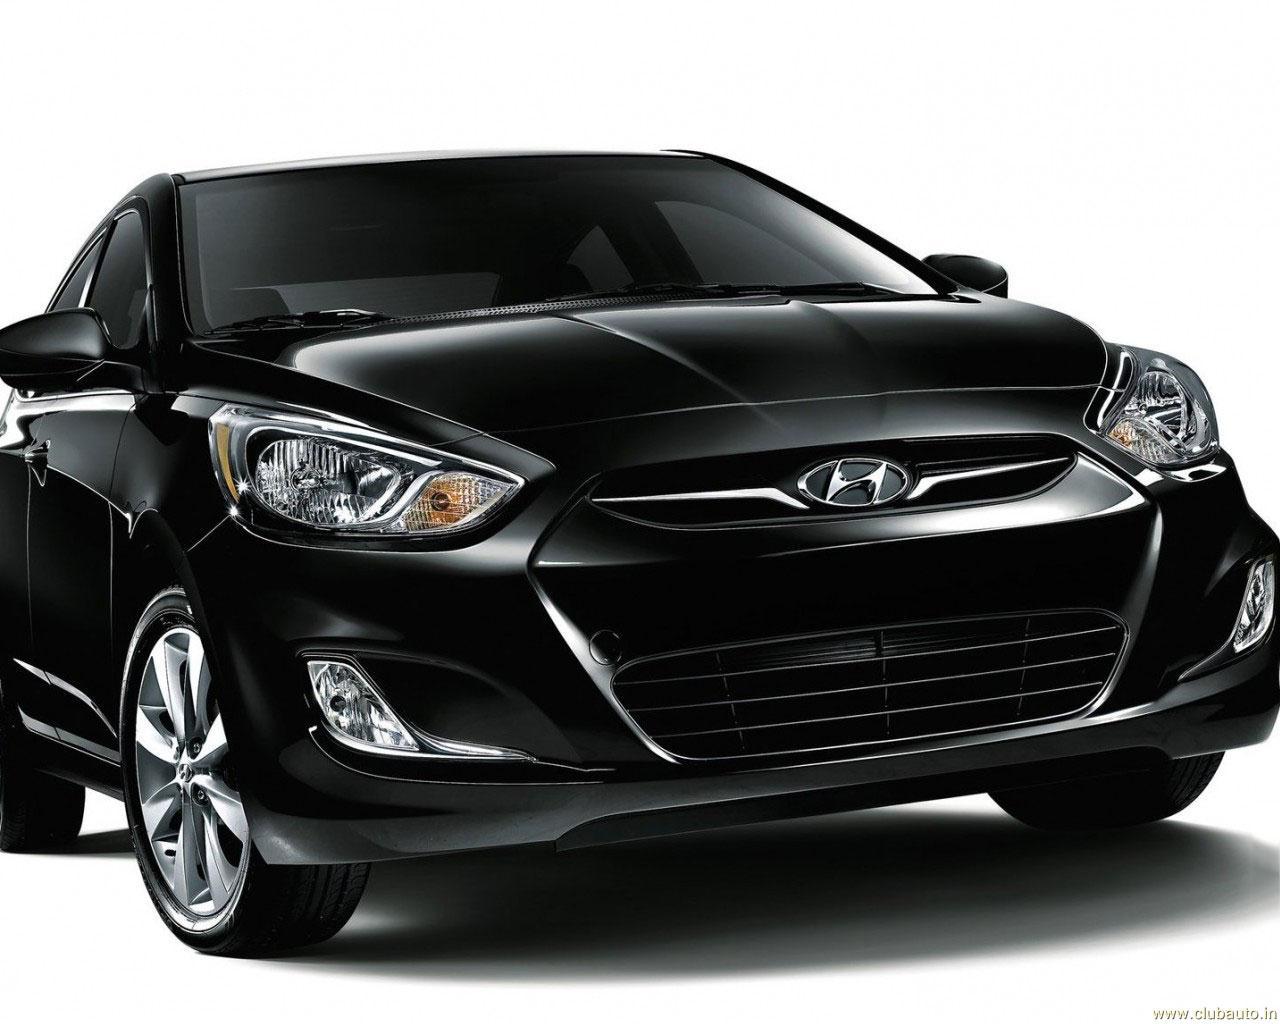 Wallpapers Cars Hyundai Verna Fluidic Hyundai Verna 1280x1024